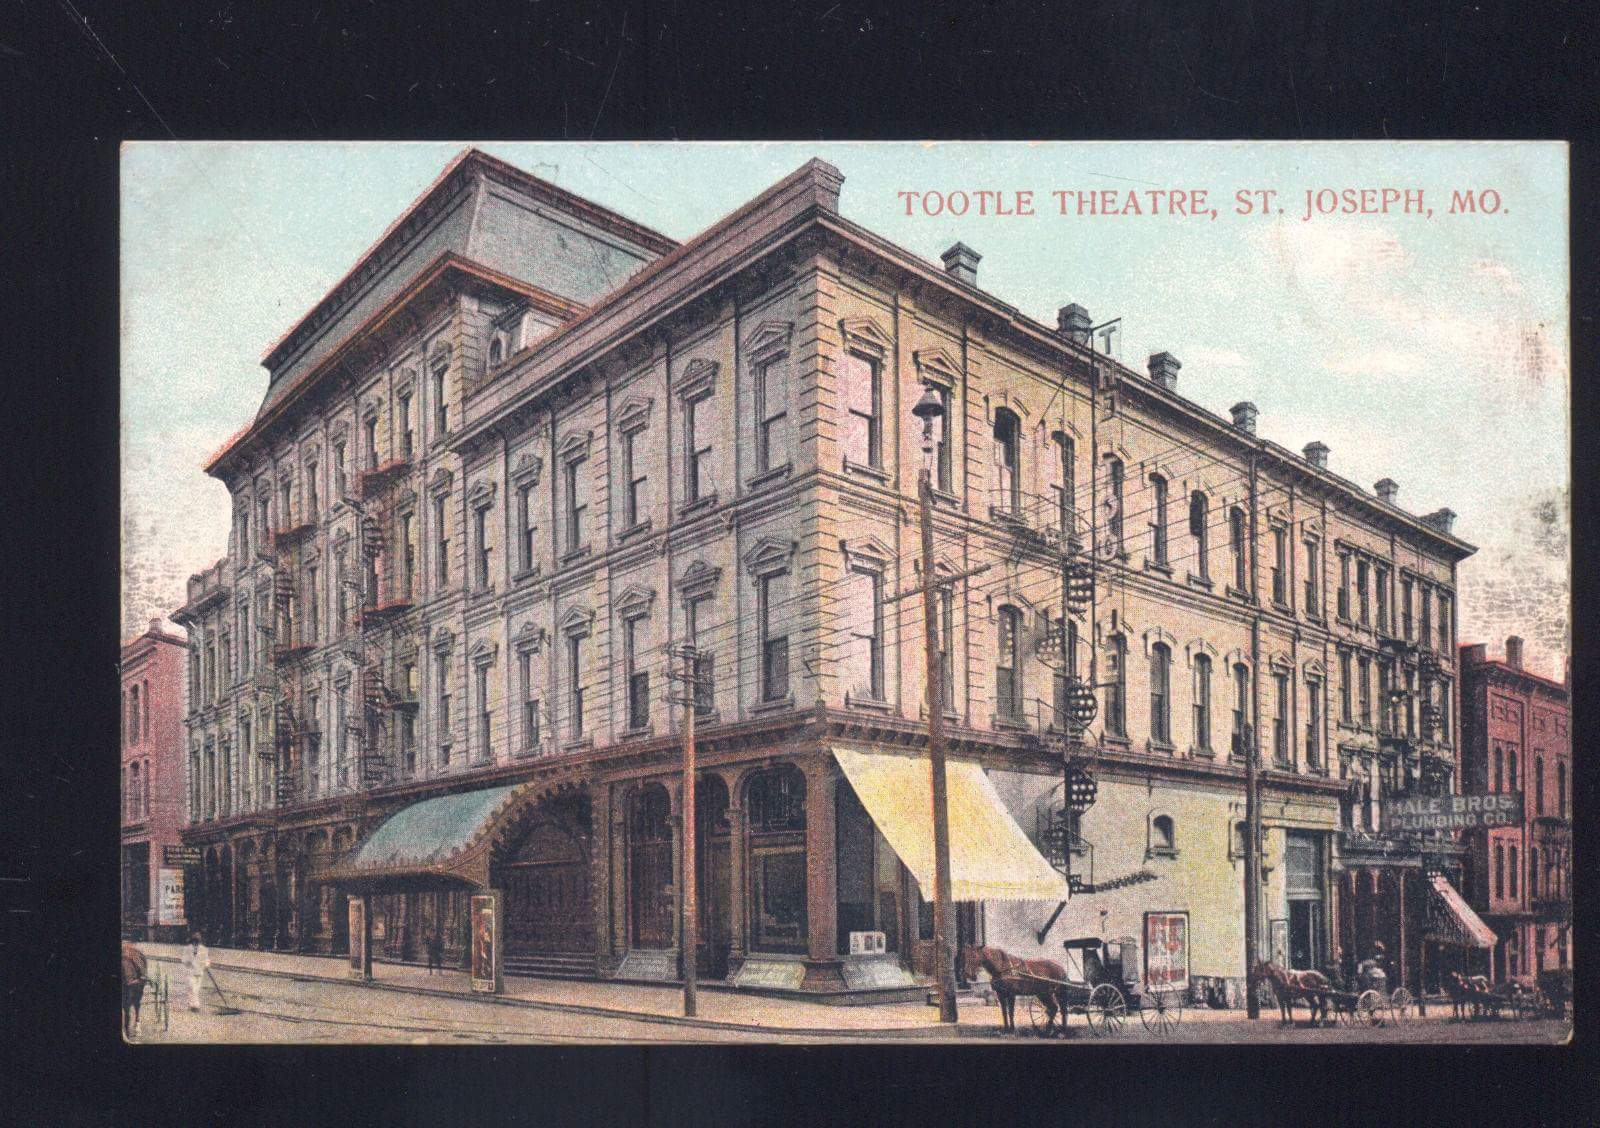 Tootle Theatre St. Joseph Mo